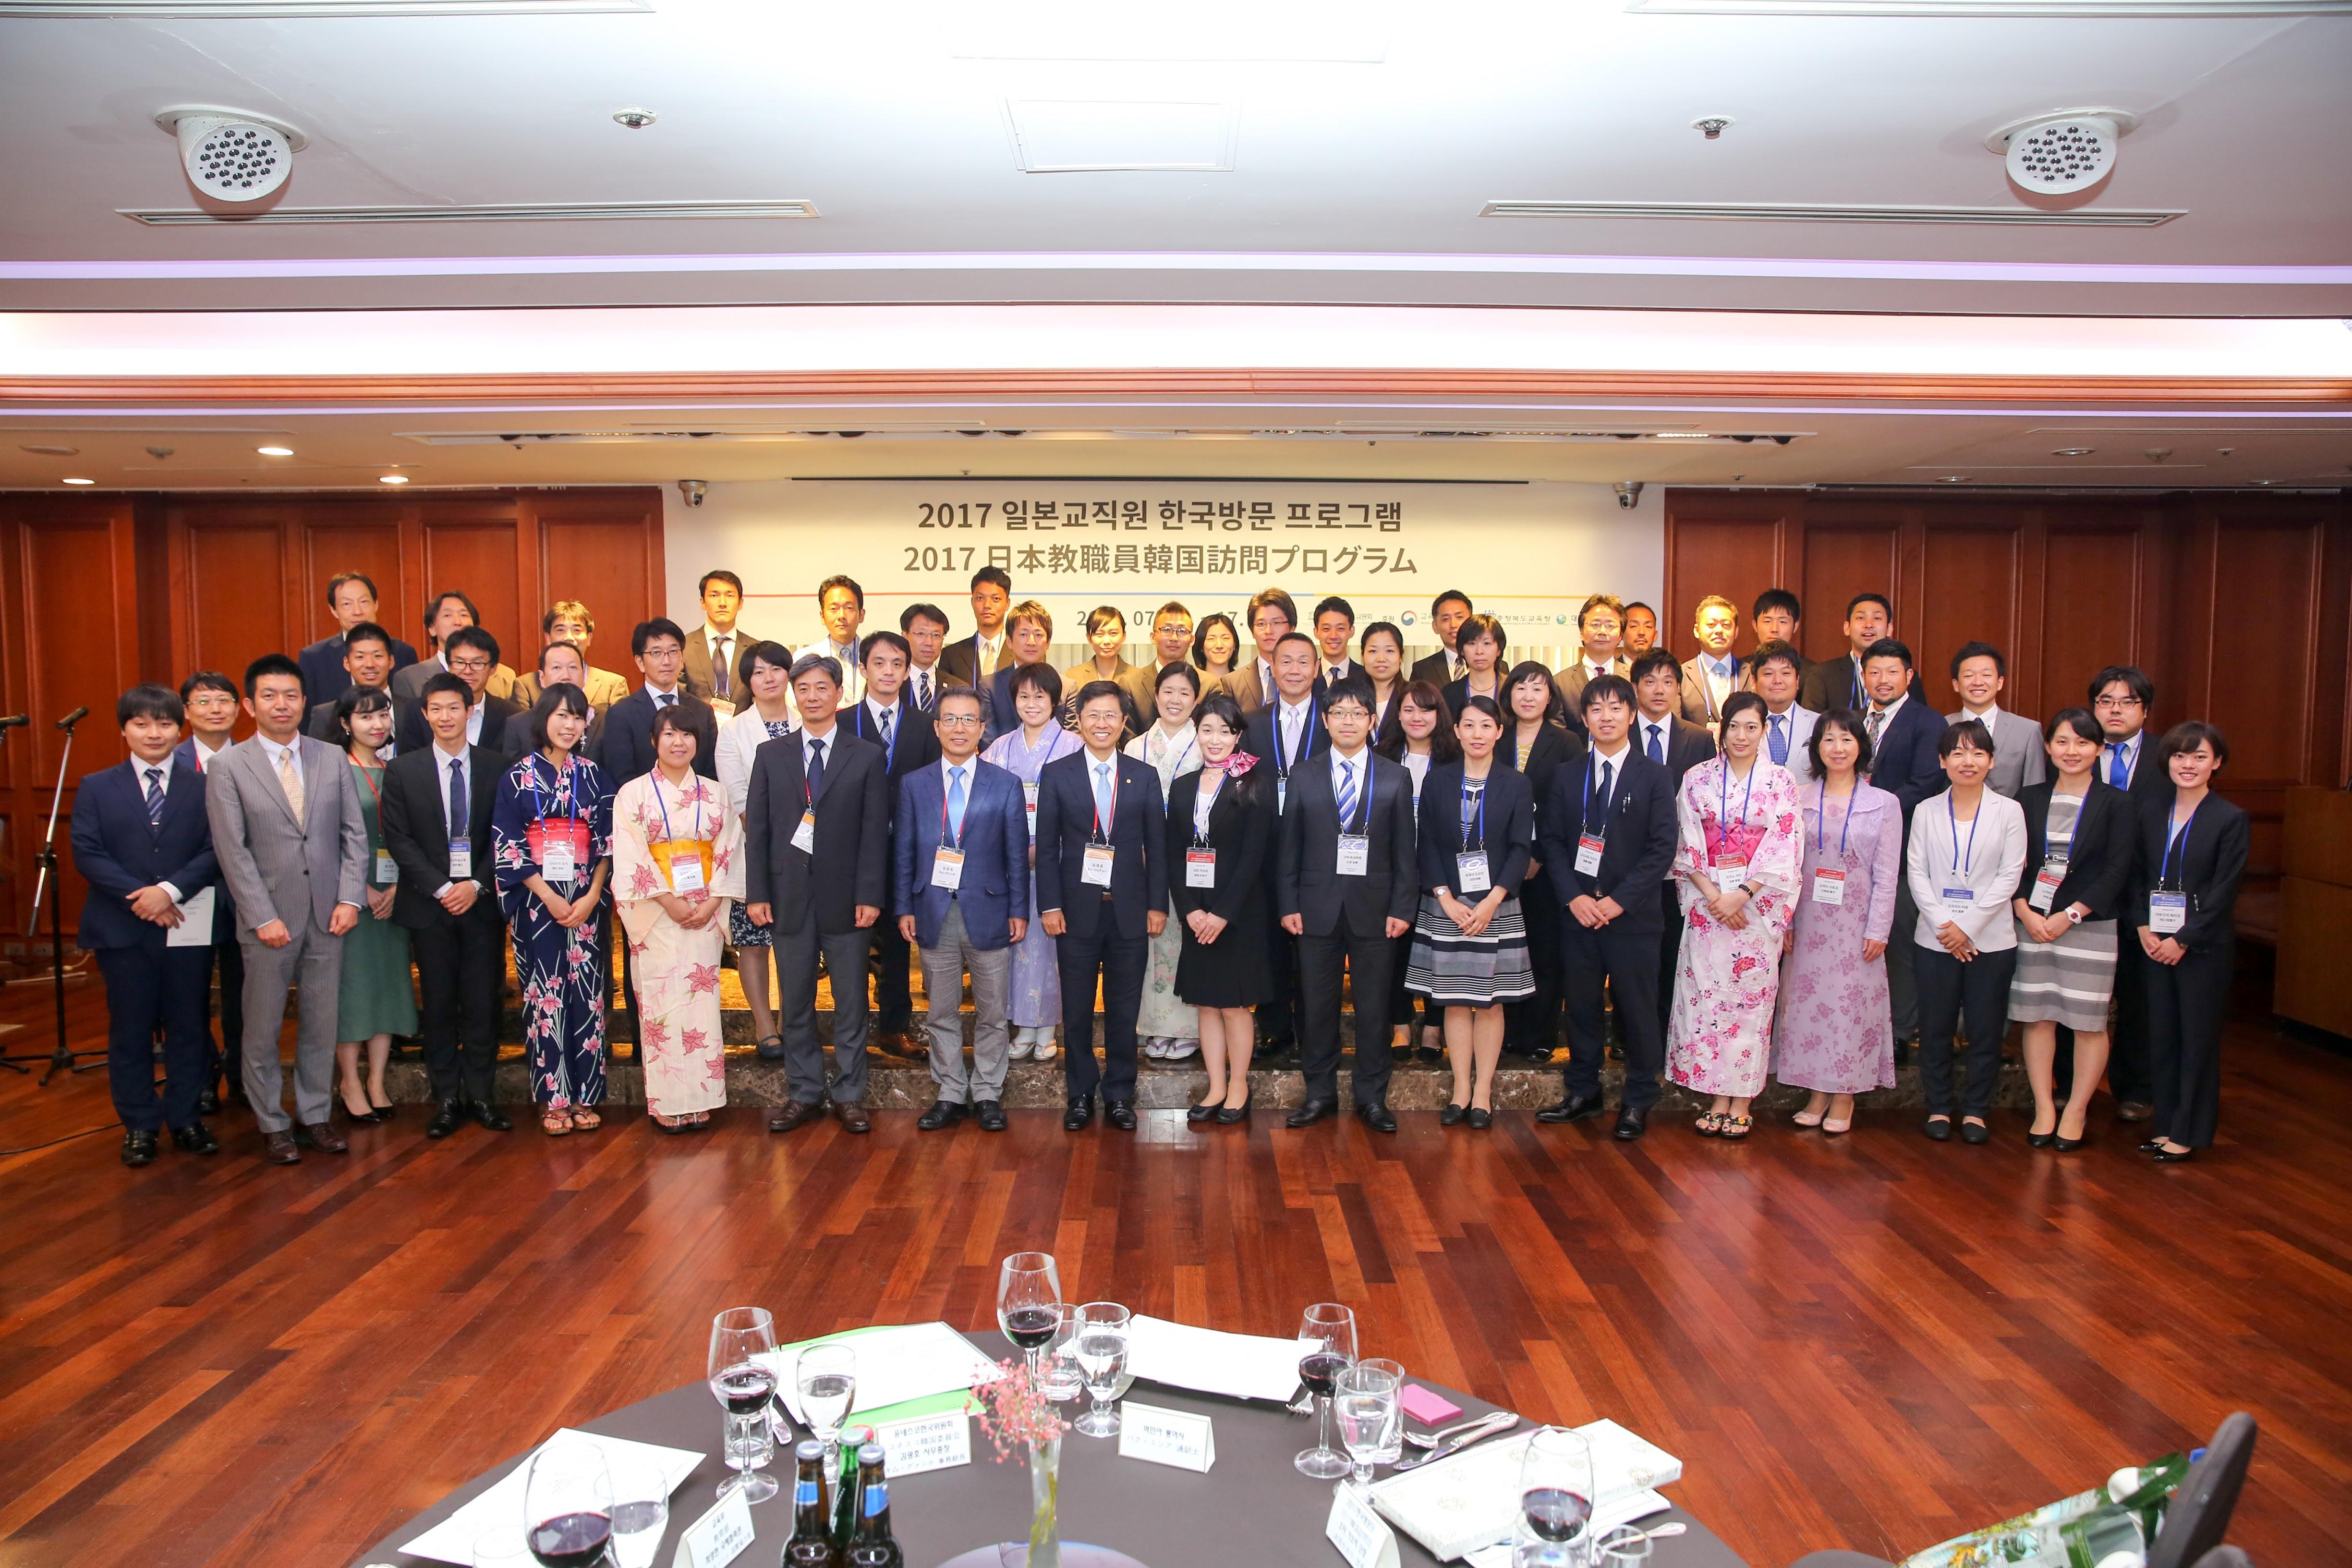 2017 UNESCO Korea-Japan Teachers' Dialogue 사진